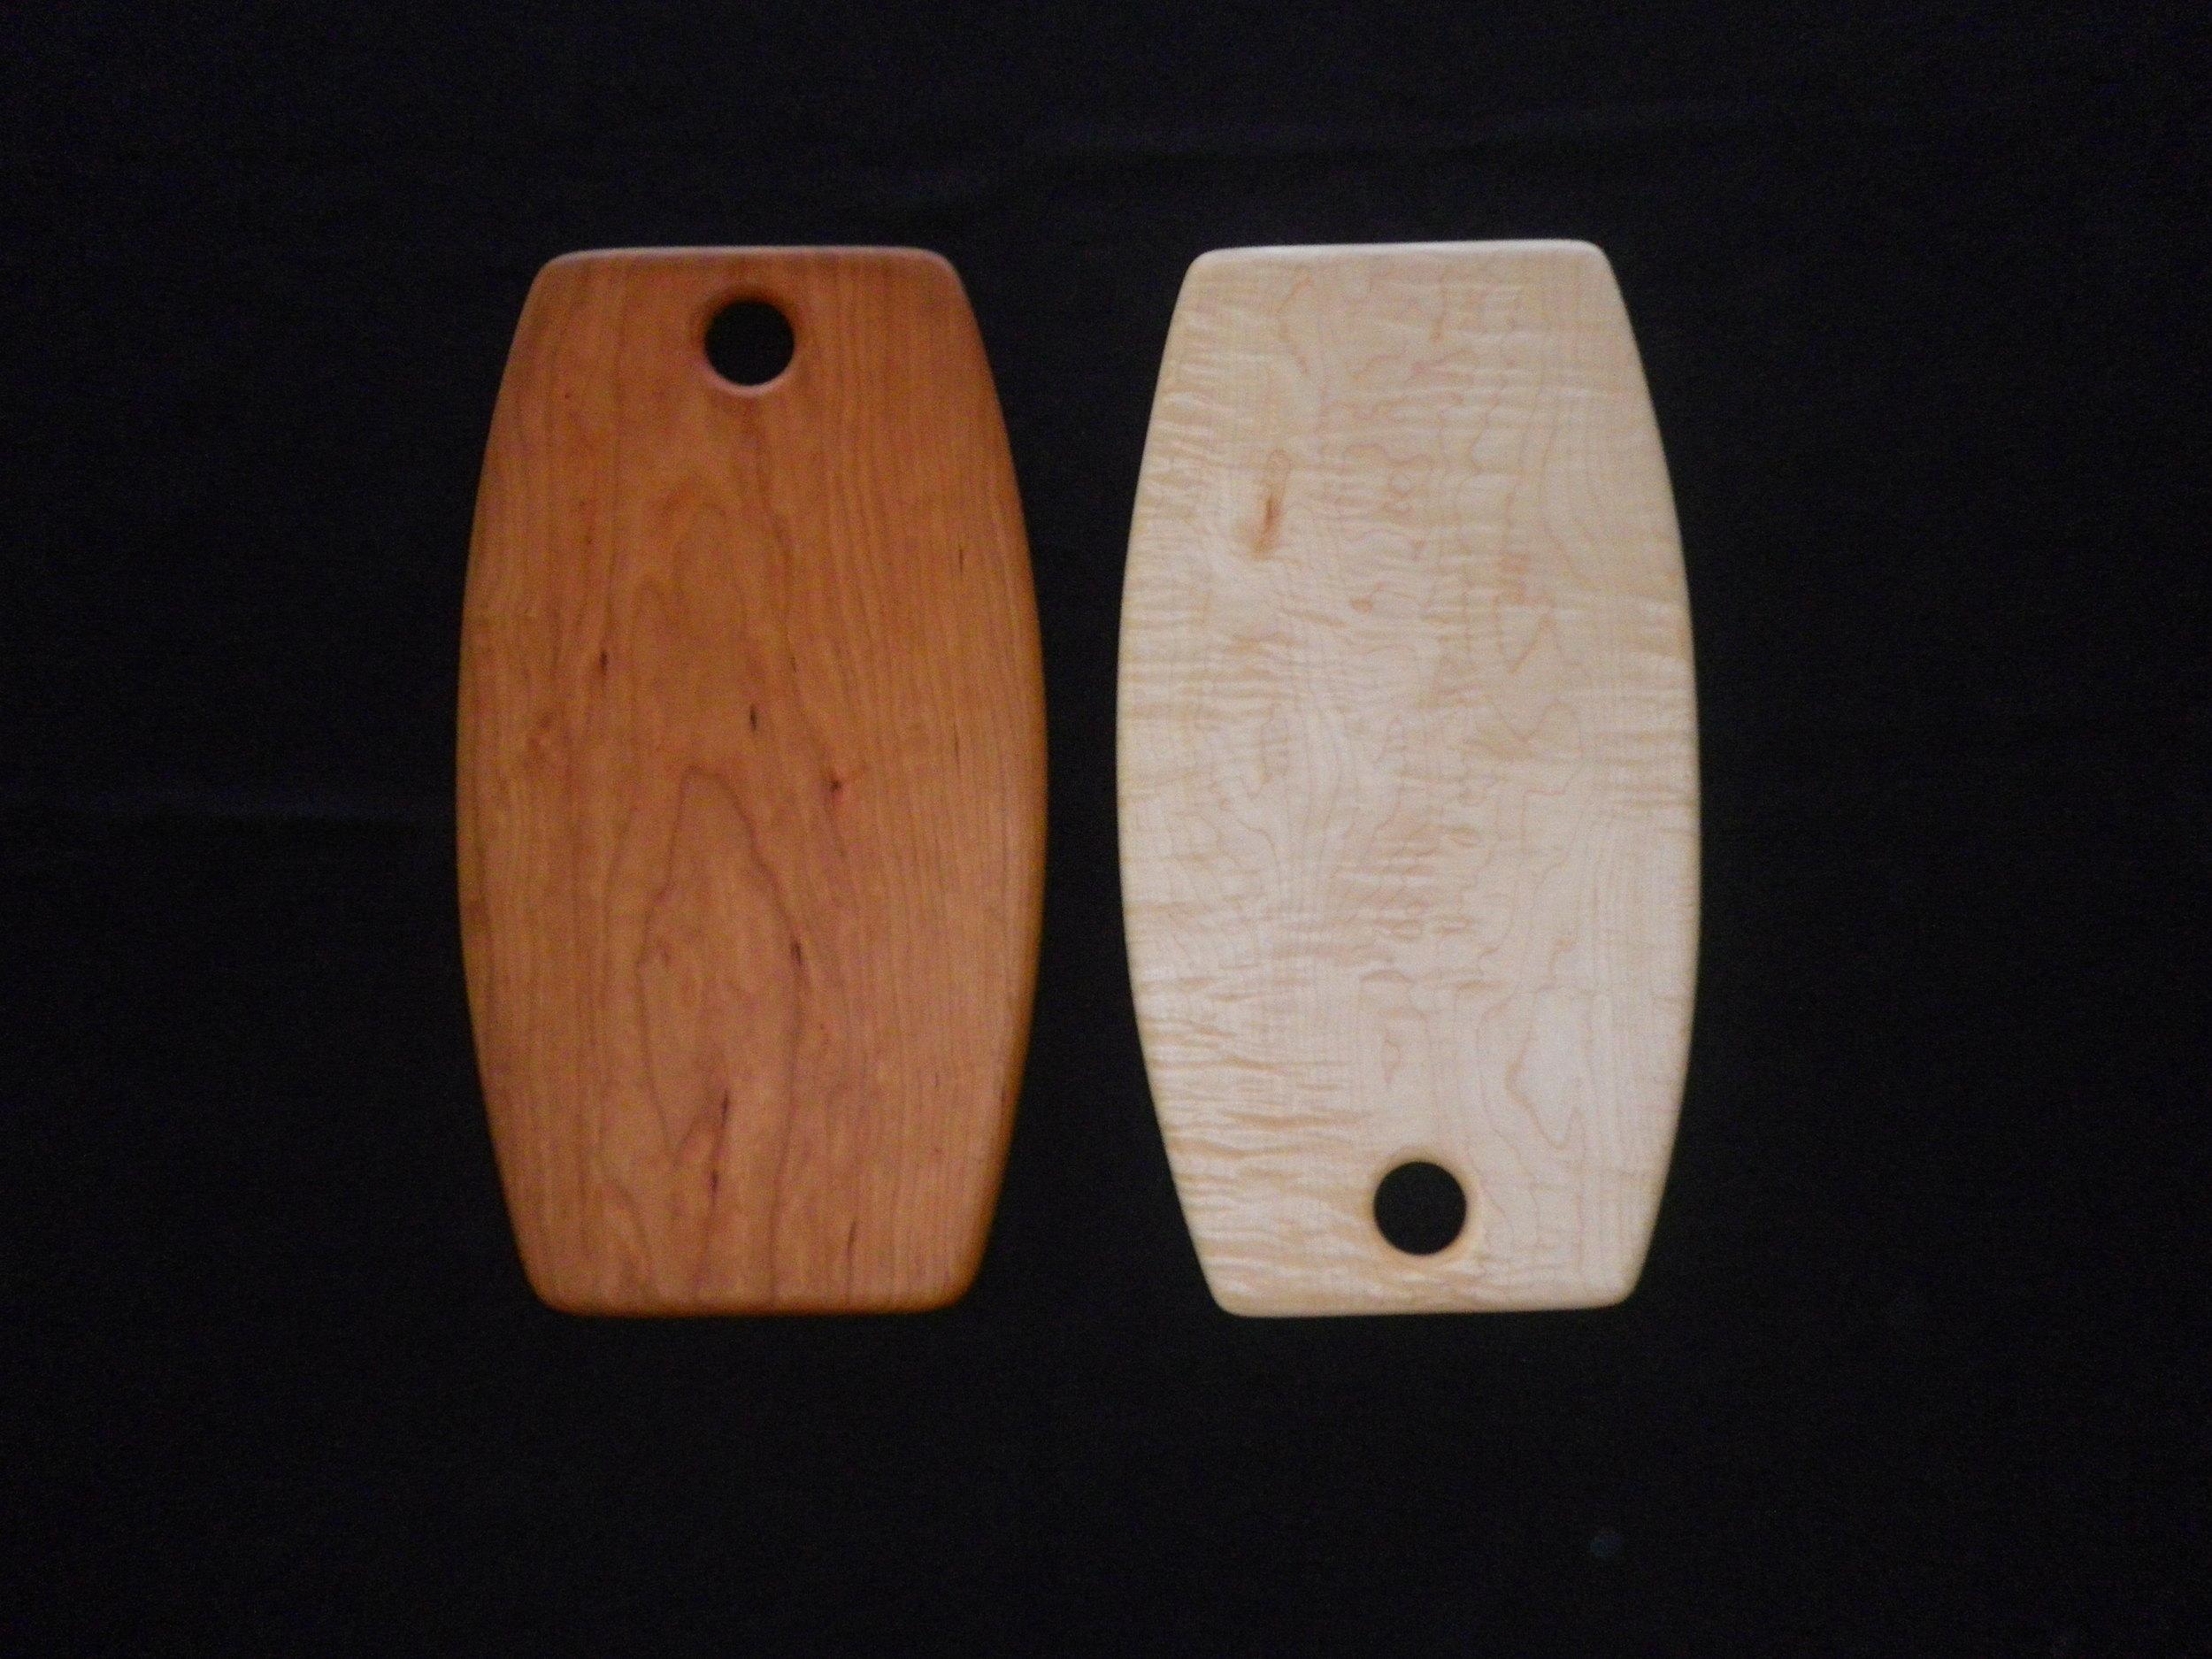 boards 2 001.jpg